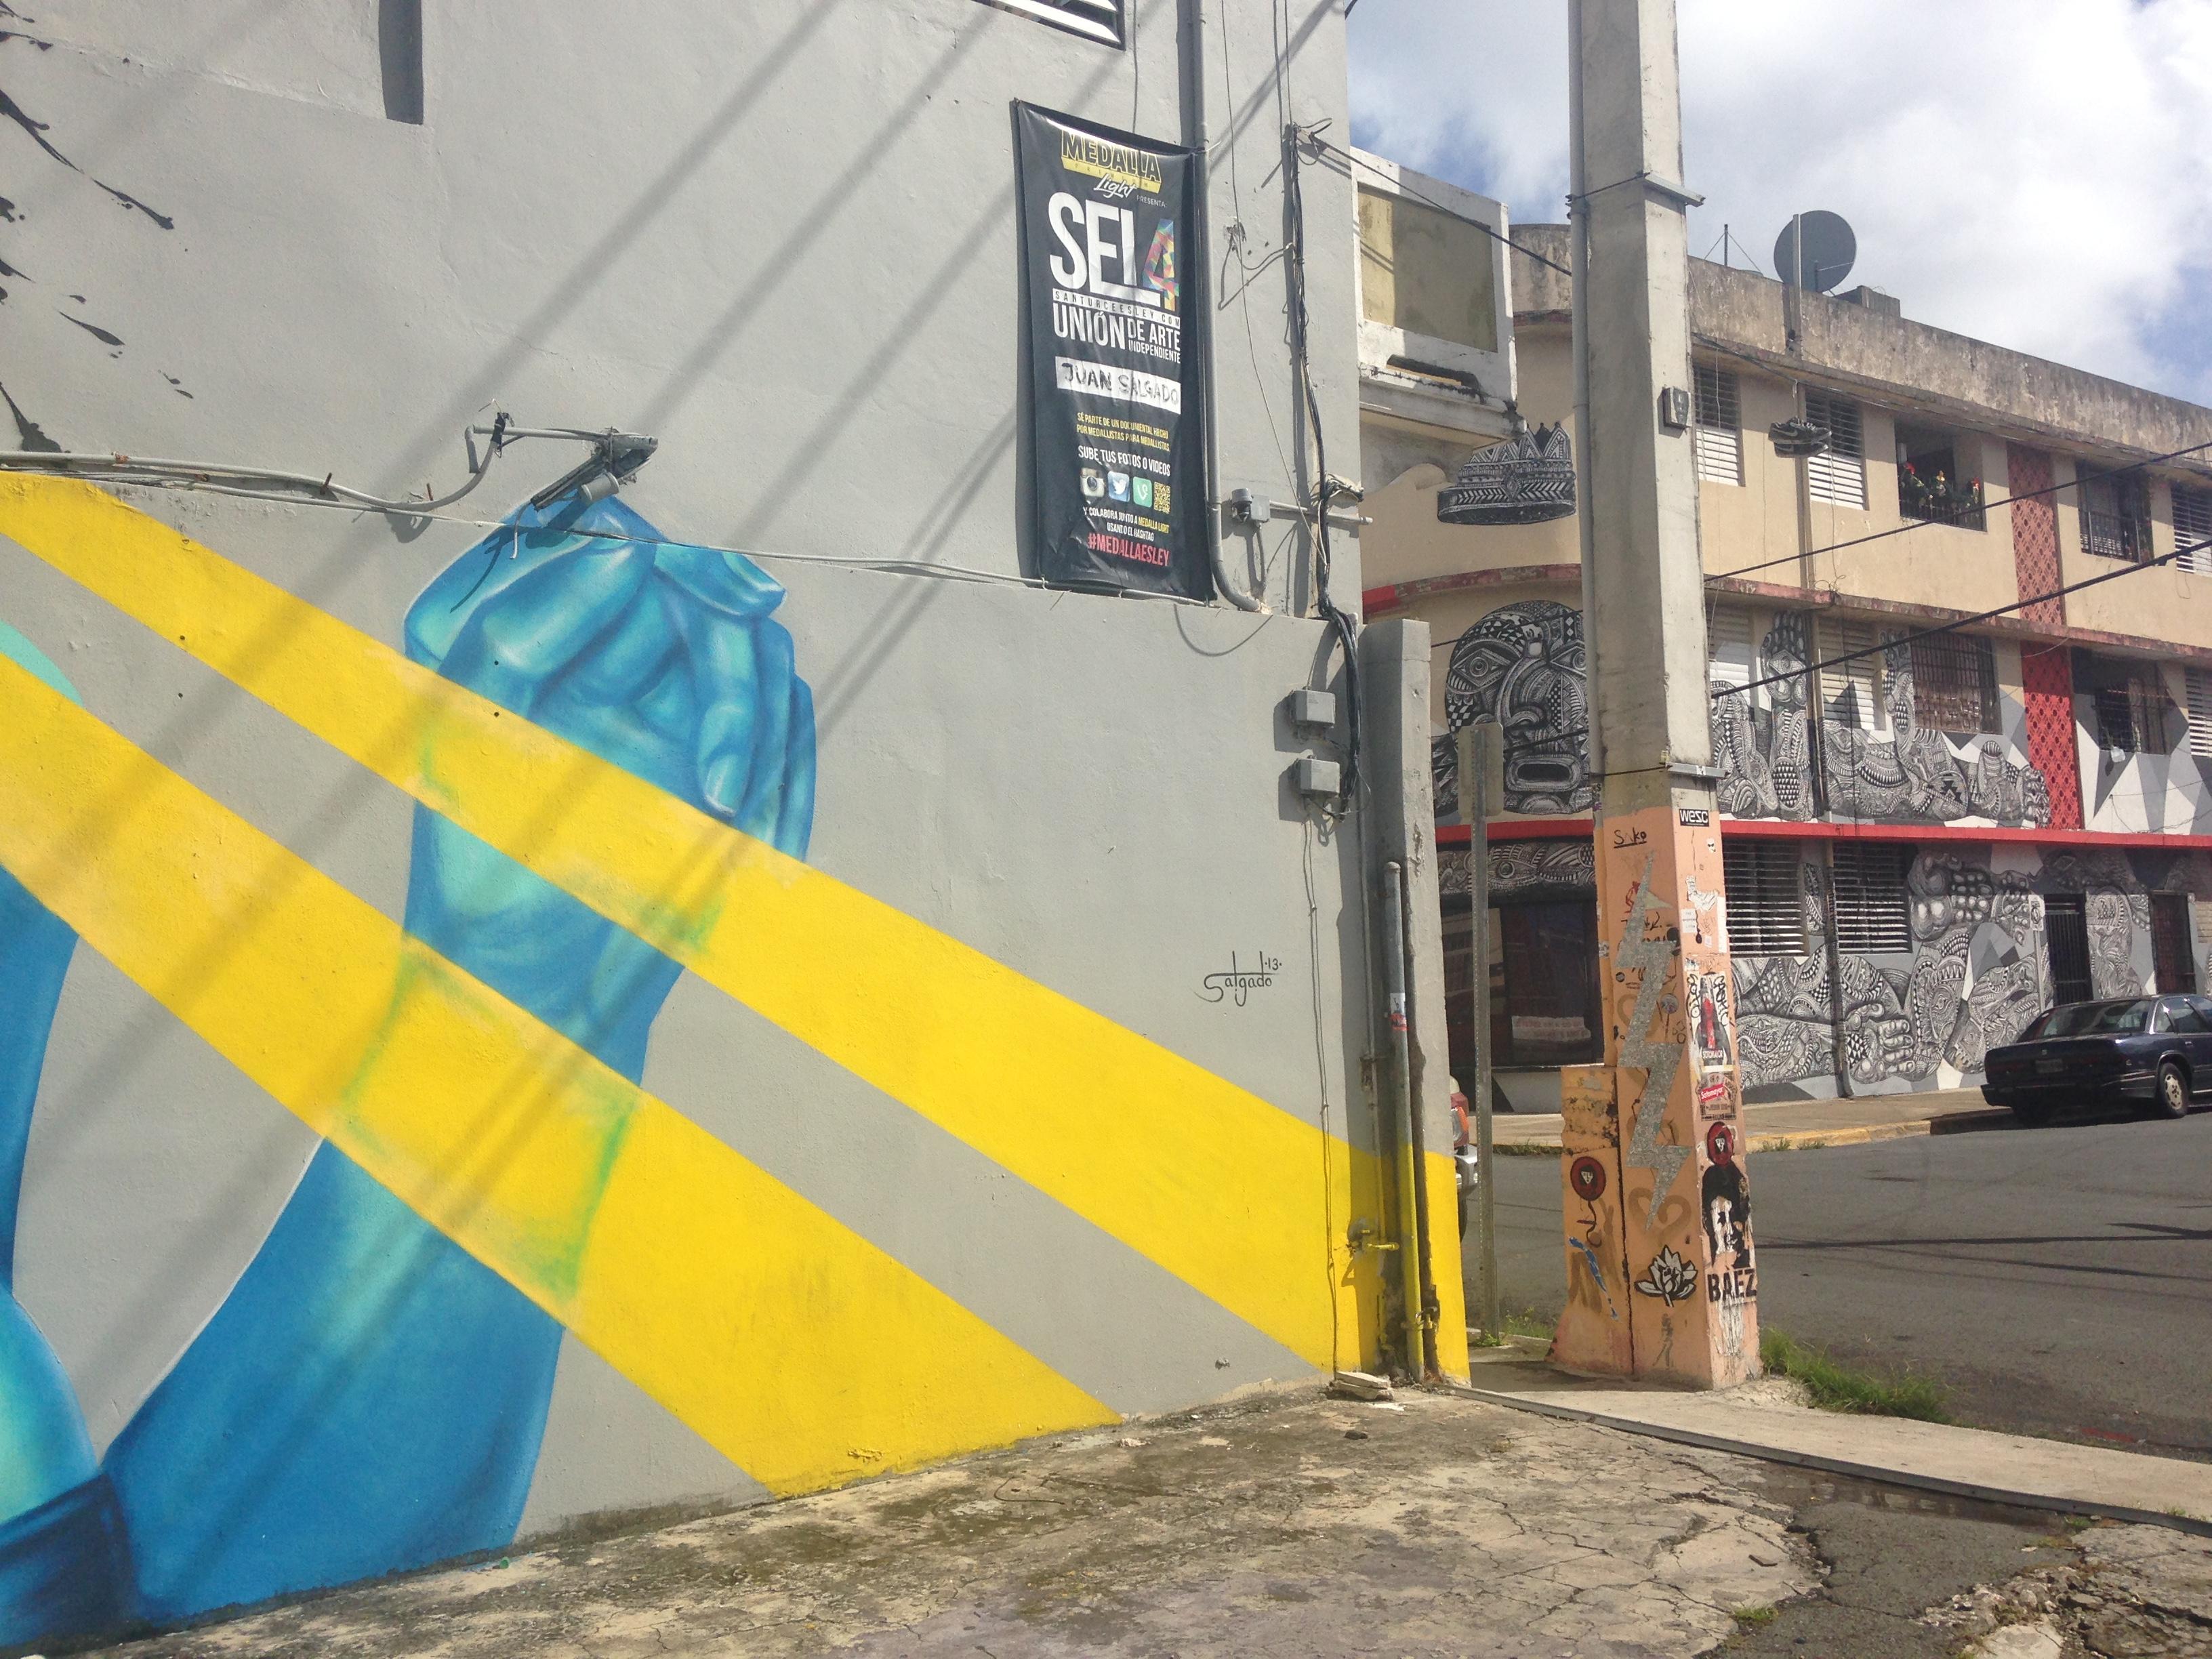 Juan Salgado: San Juan, Puerto Rico | Street Art is Everywhere